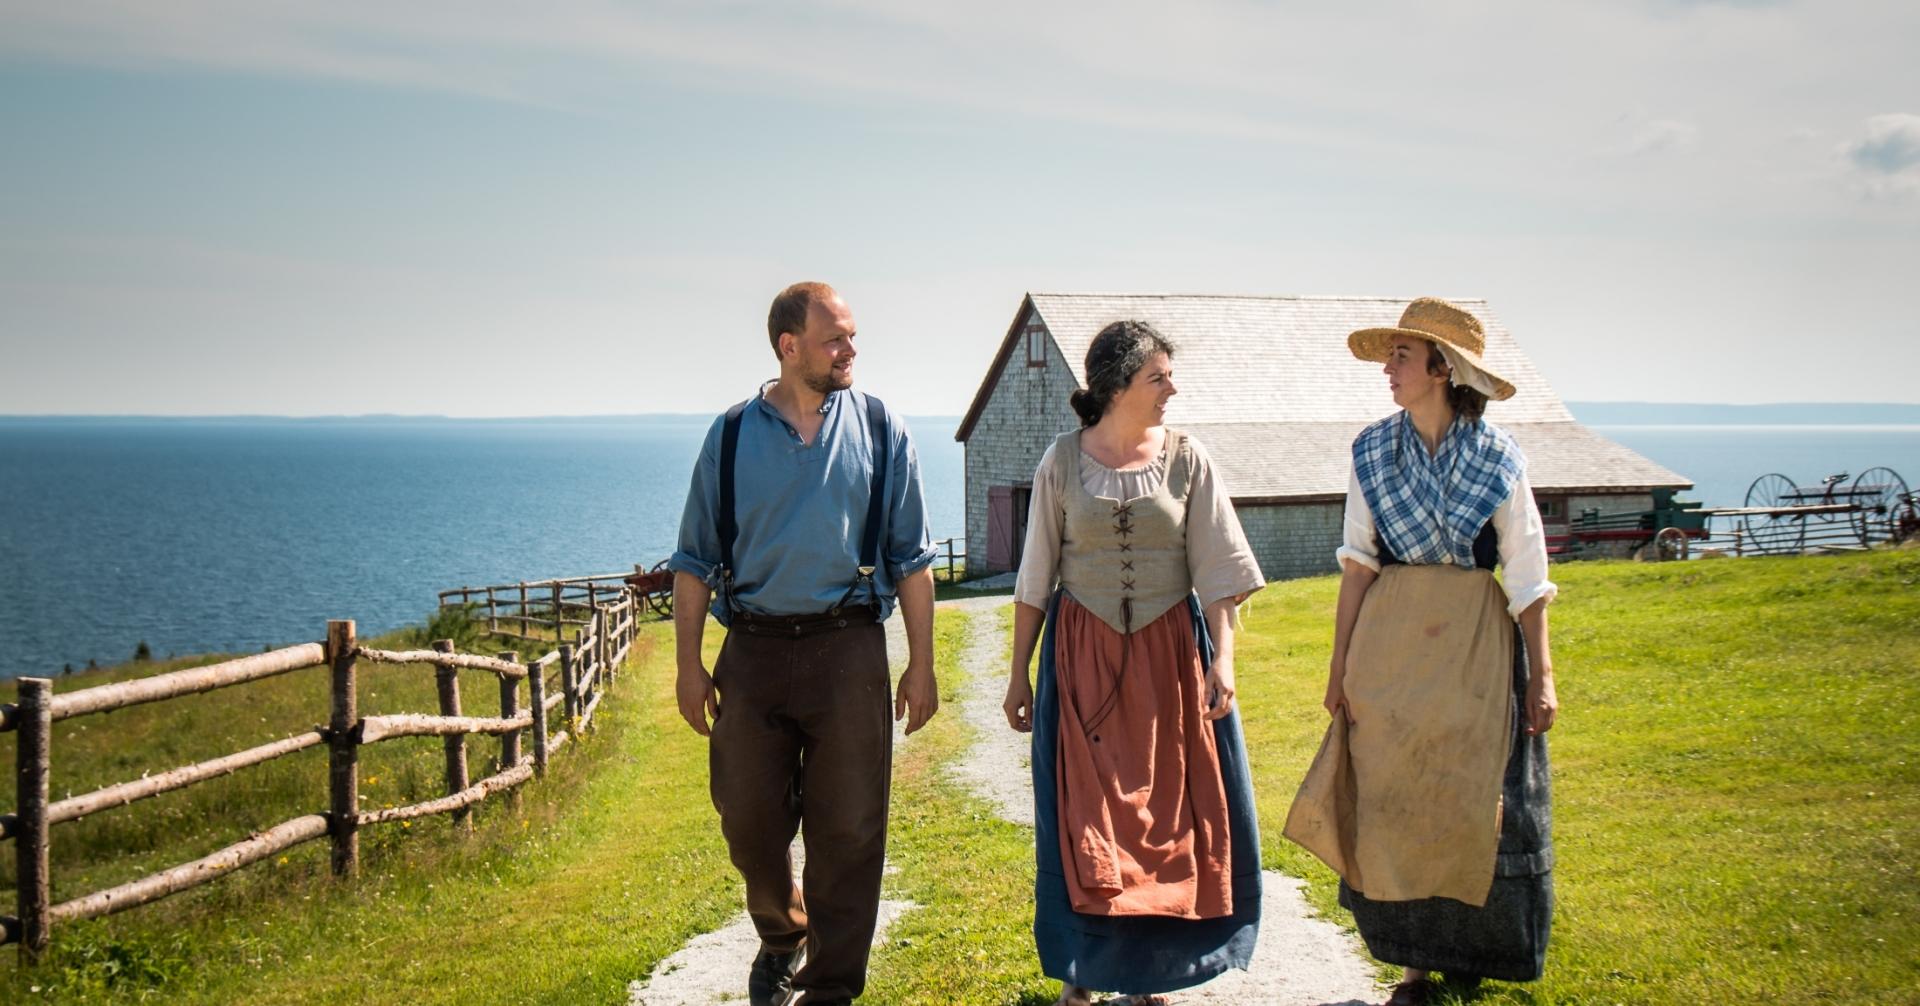 three Cape Bretoners in historic clothing walk outside